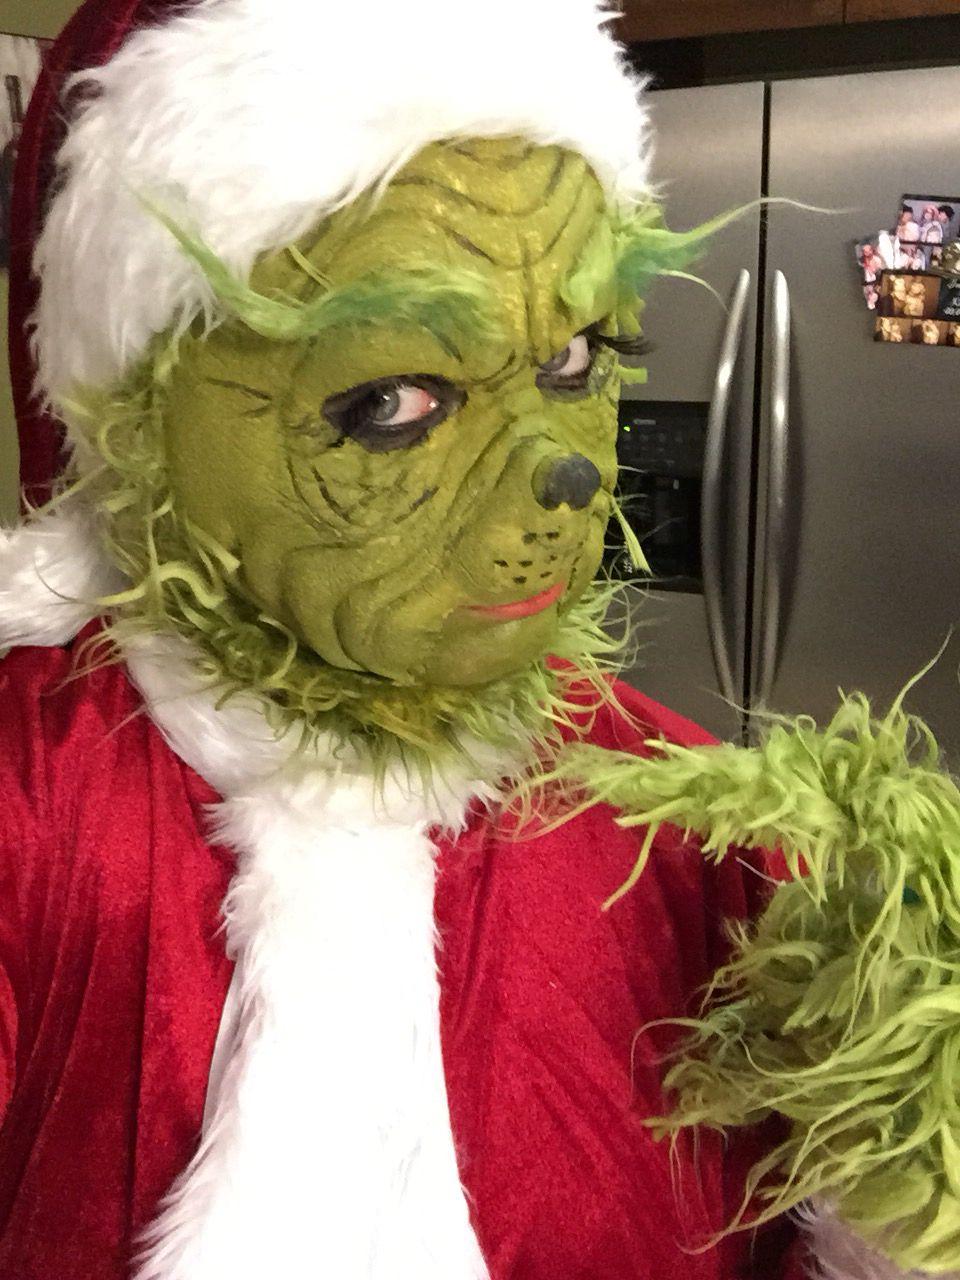 The grinch Halloween costume Christmas diy homemade.. youtube ...